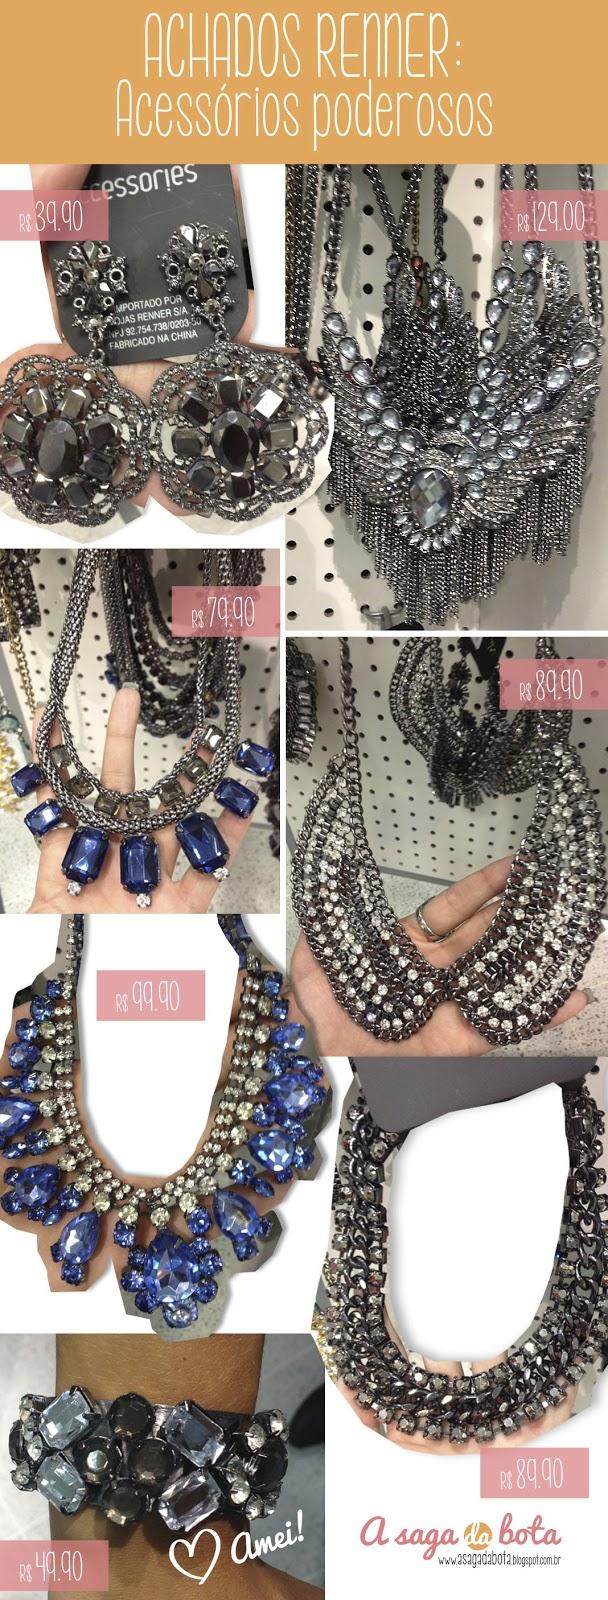 maxi colar, maxi brinco, prata, Ônix, azul, bracelete, rico, joia, bijouterias, rica